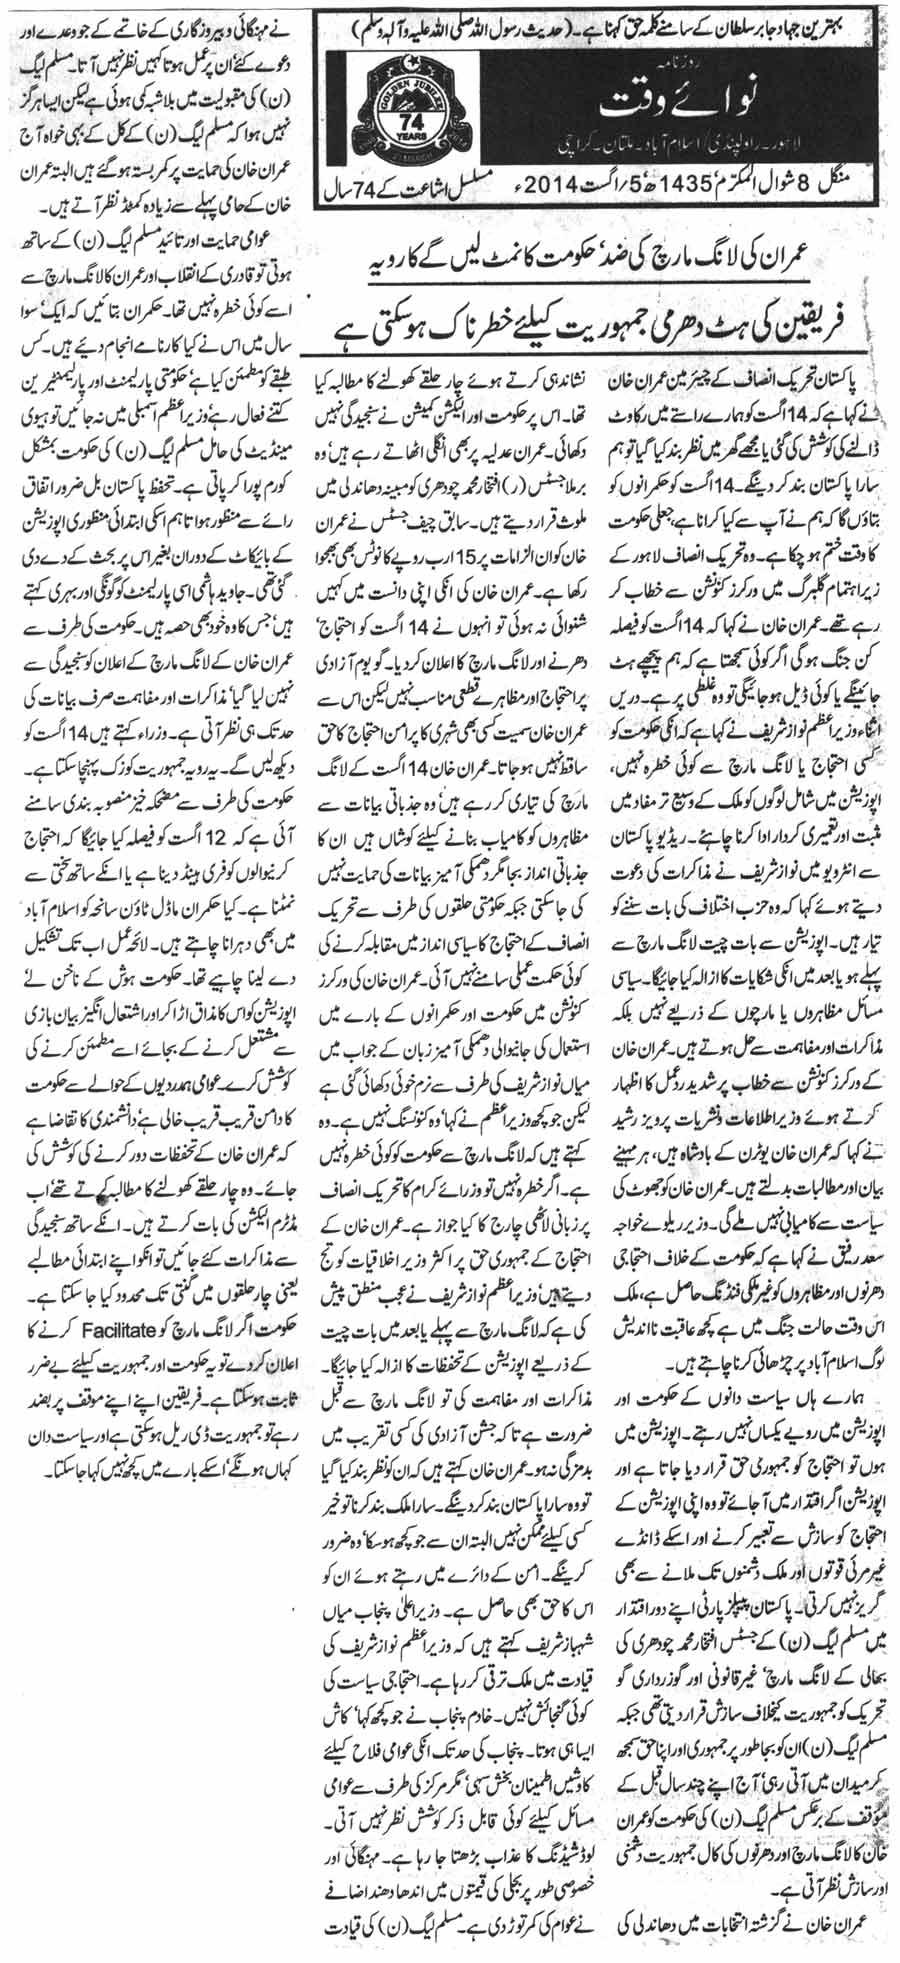 Print Media Coverage Daily Nawaiwaqat Editorial